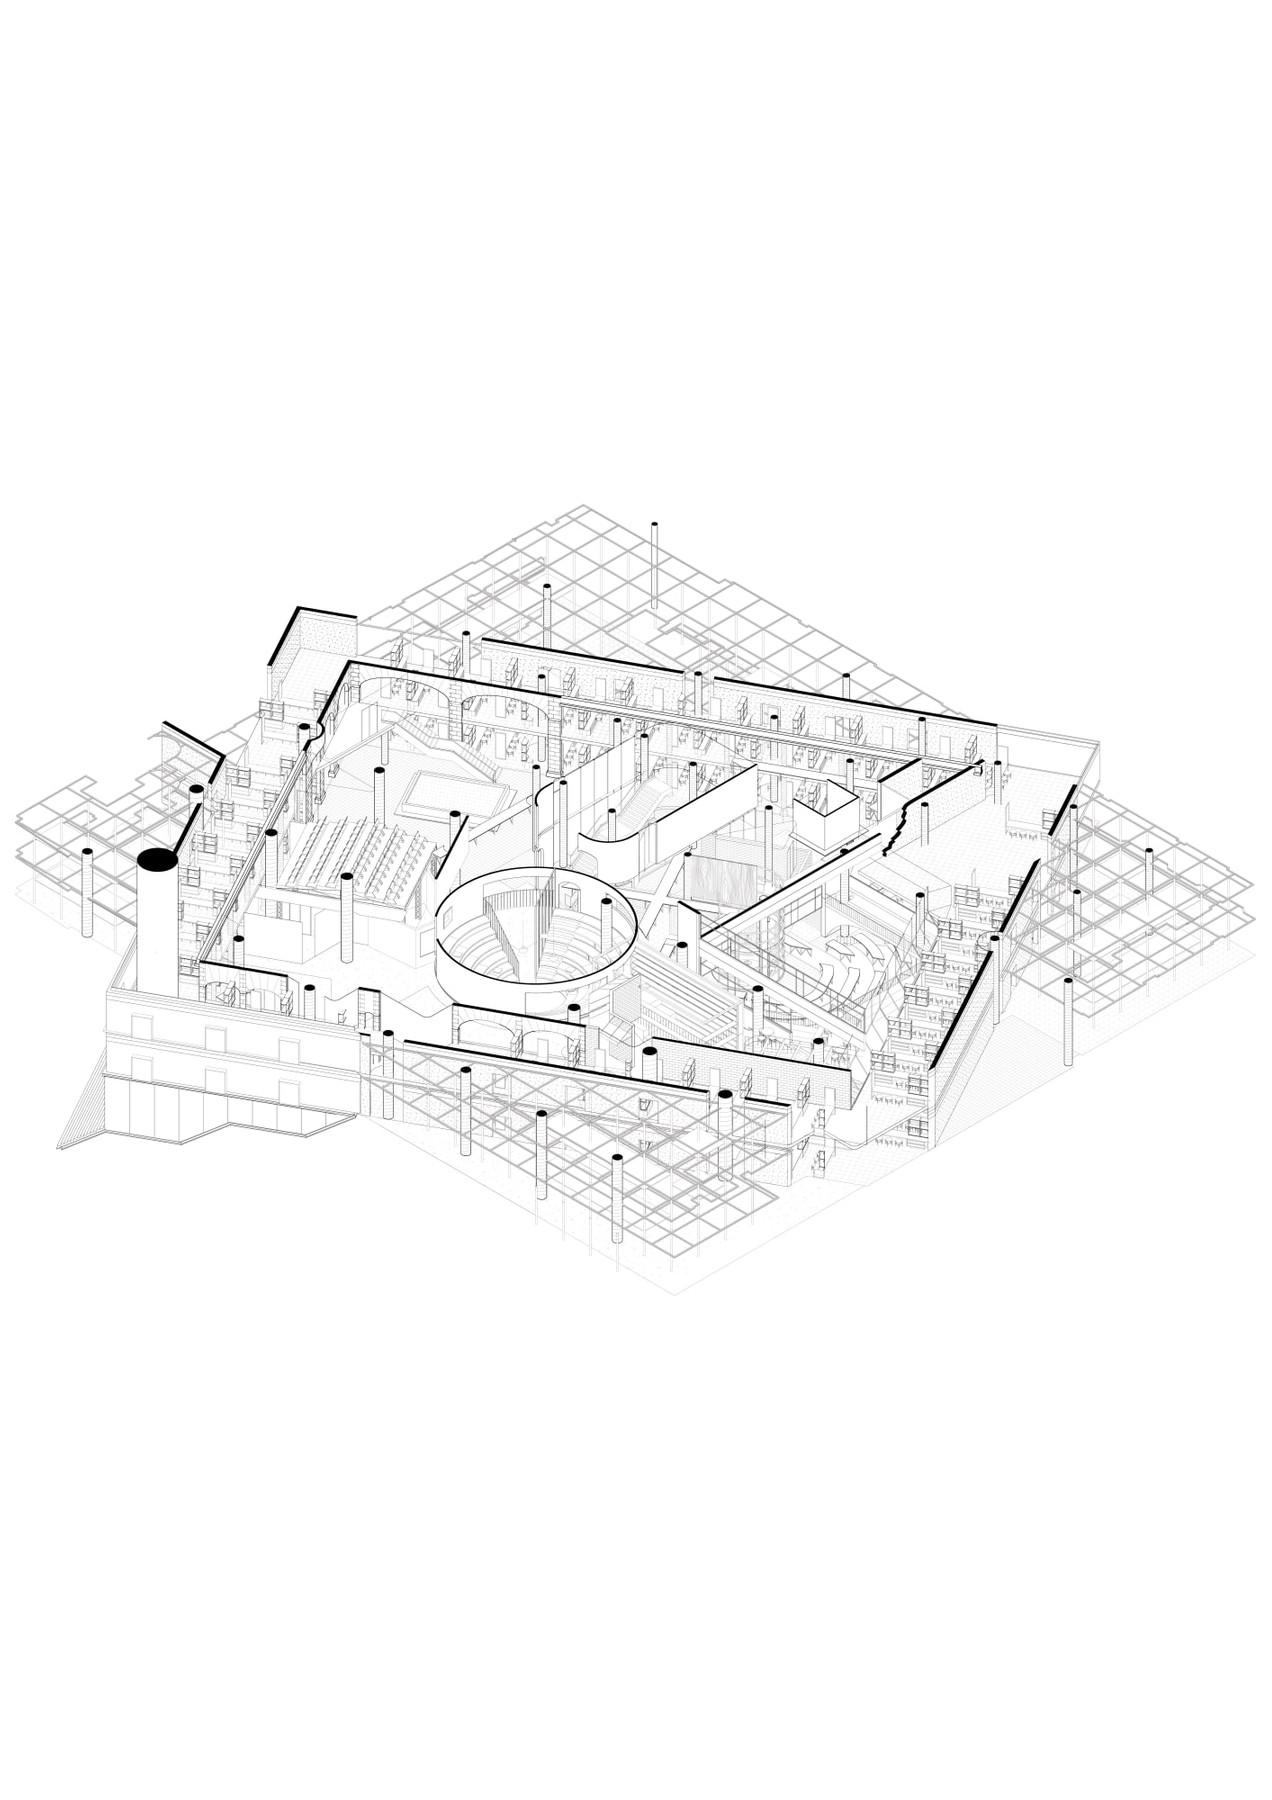 architecten de vylder vinck taillieu, uts school of architecture